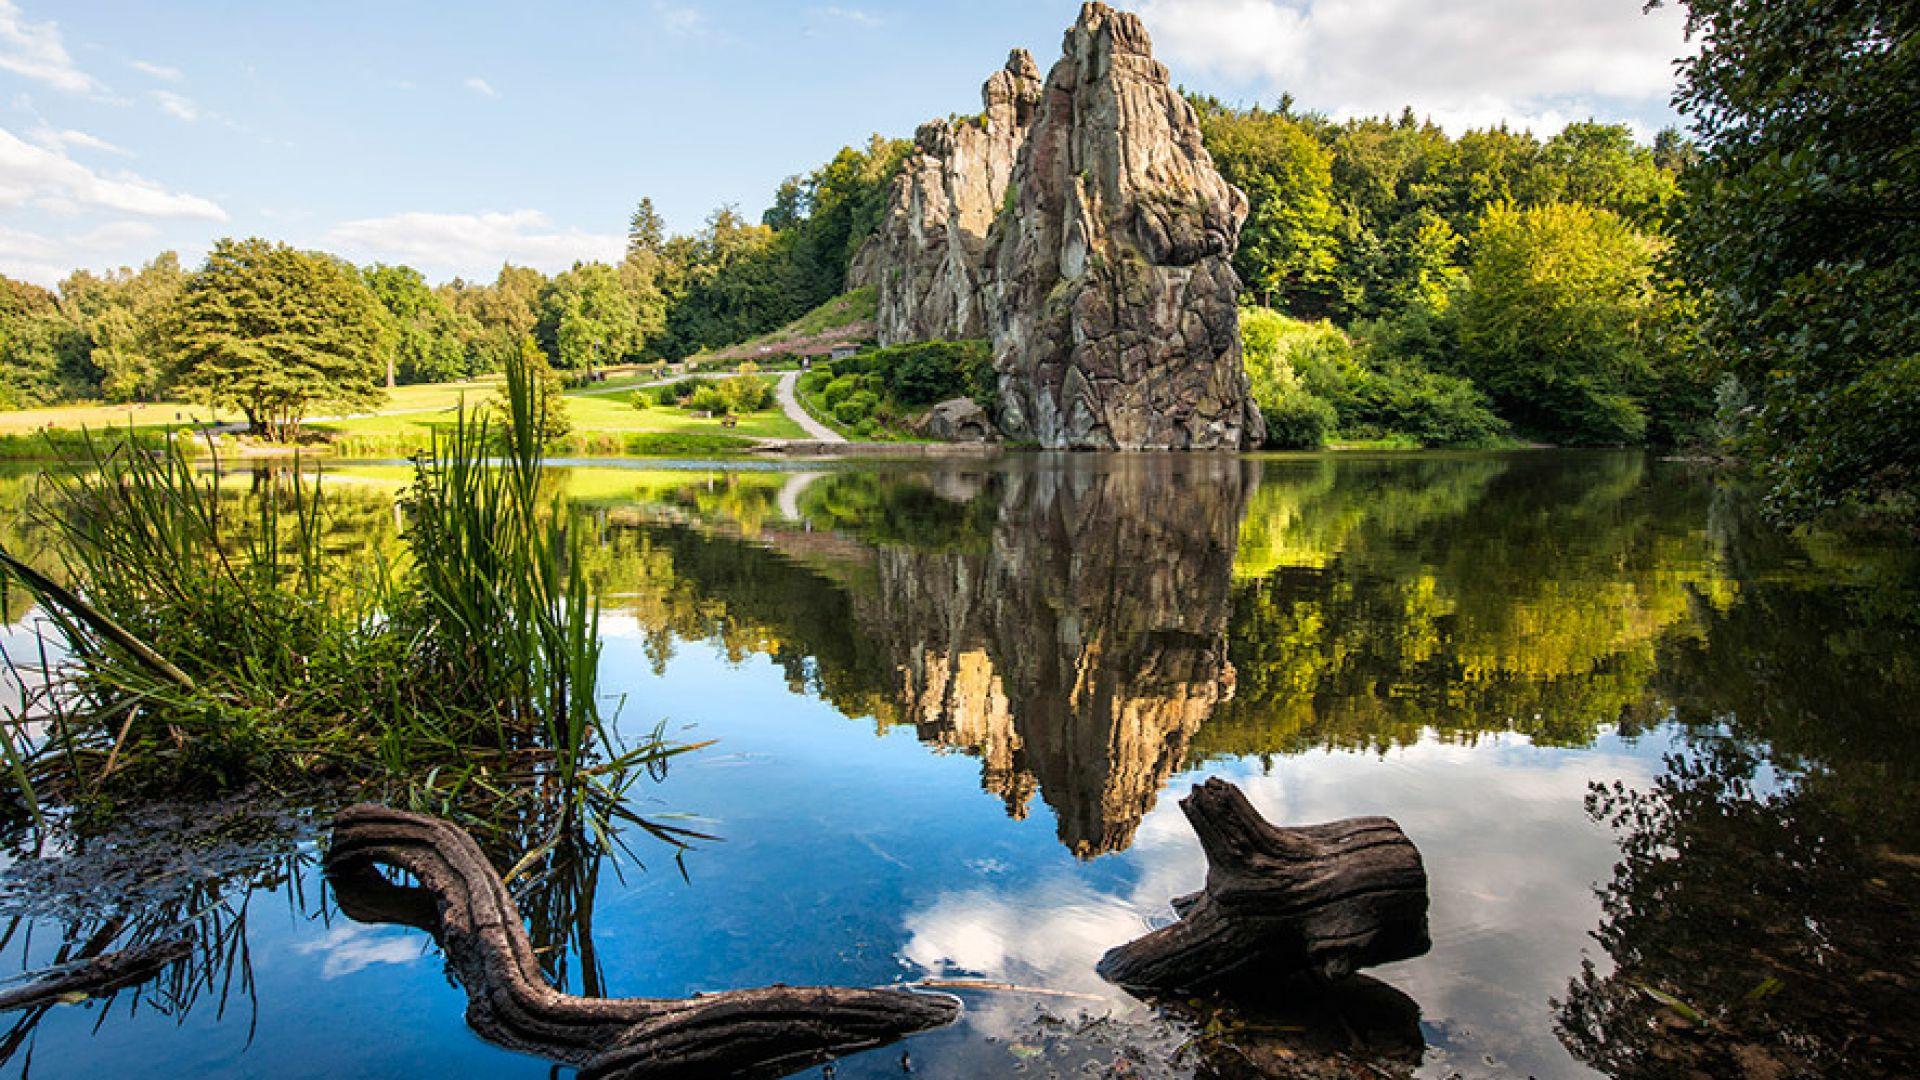 Horn-Bad Meinberg: The rock formation Externsteine in the Teutoburg Forest